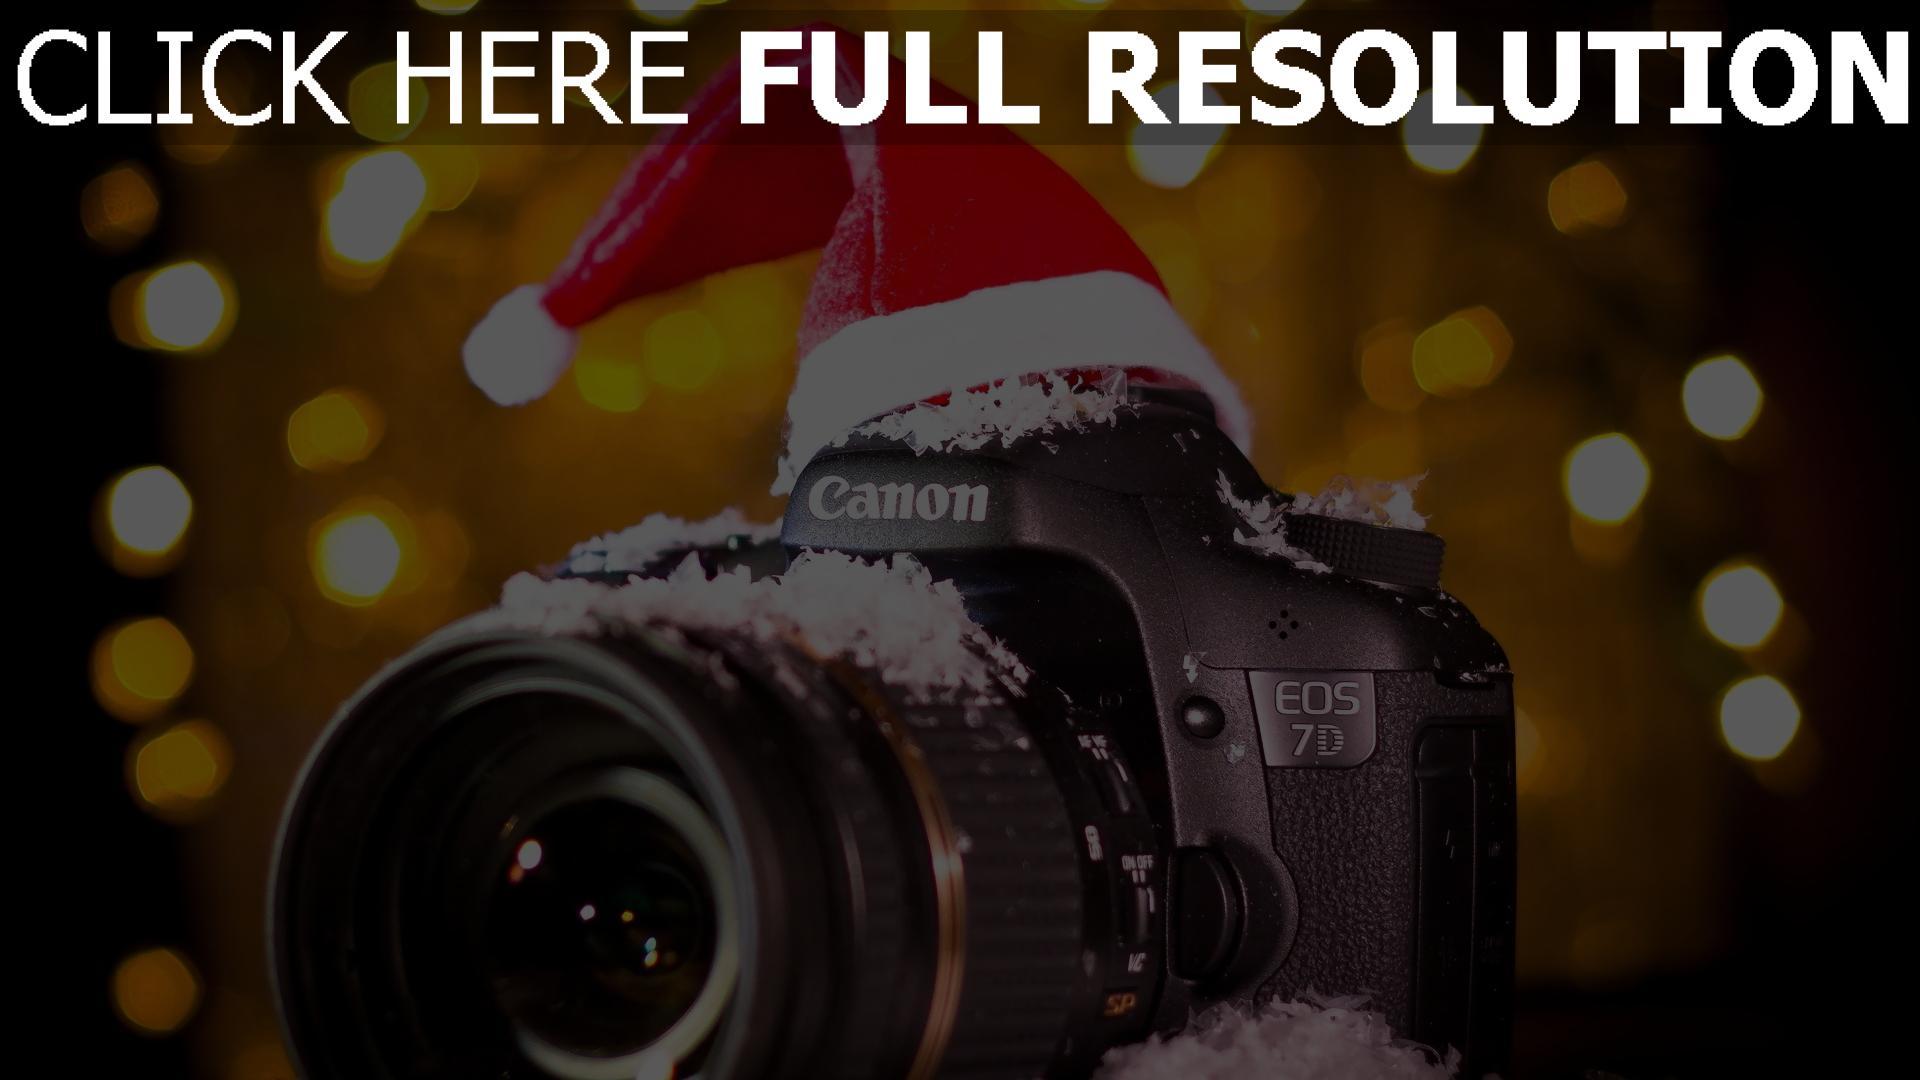 hd hintergrundbilder canon eos 7d kamera schnee kappe pailletten 1920x1080